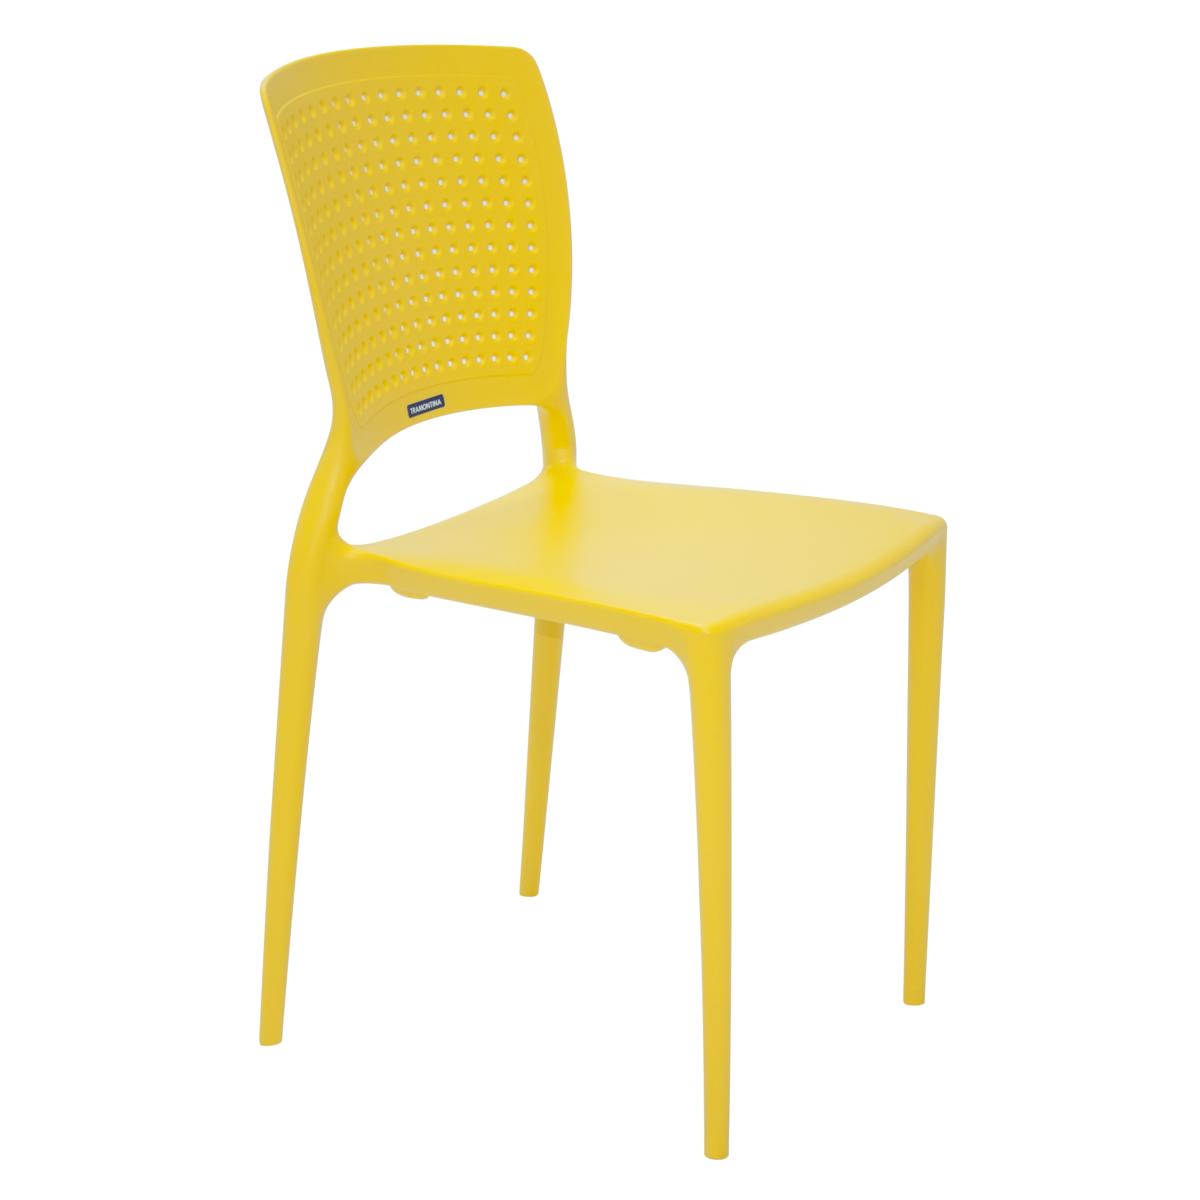 Cadeira Safira de Polipropileno e Fibra de Vidro Amarelo - Tramontina